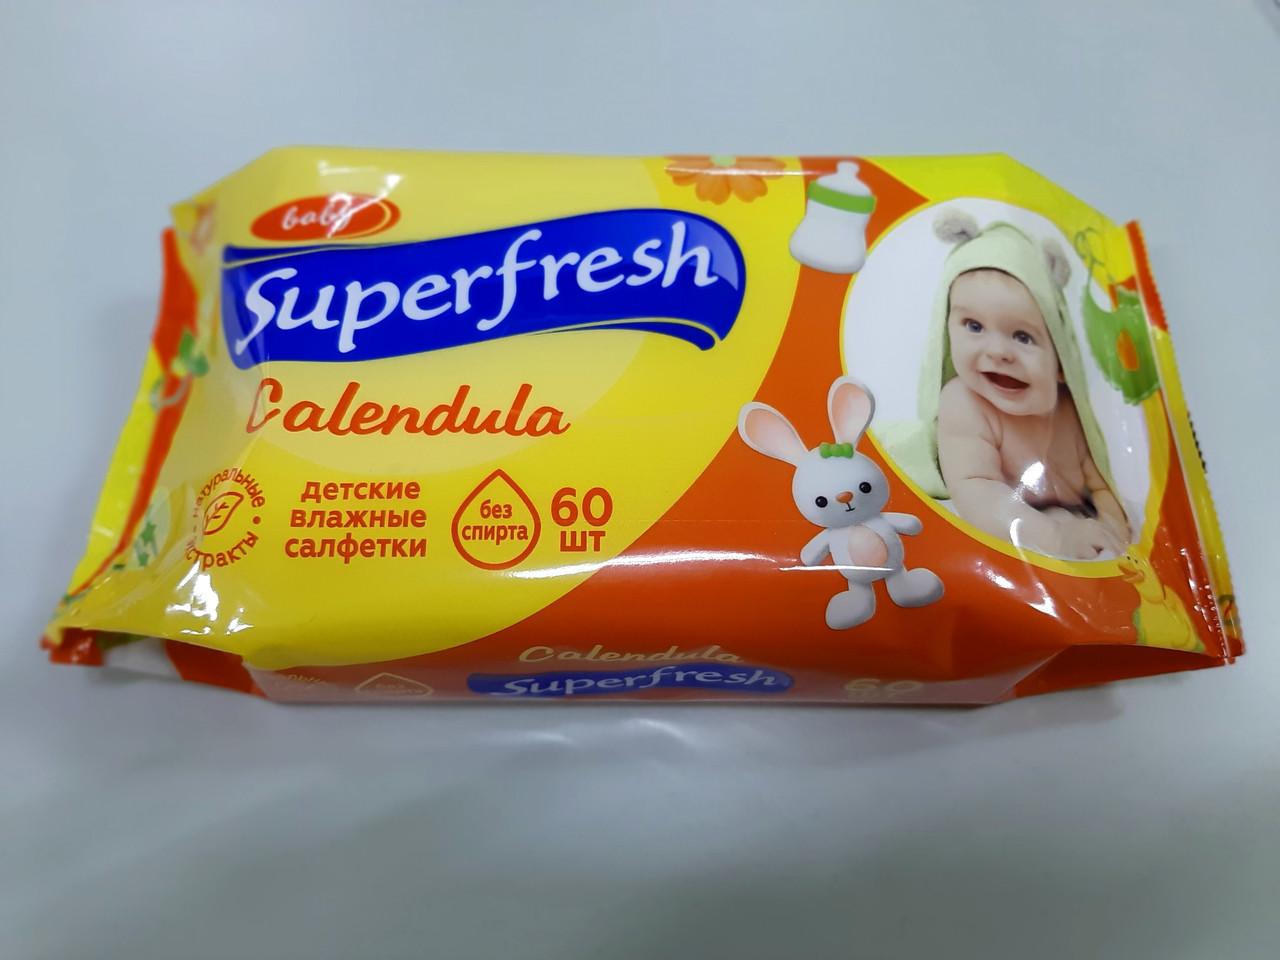 Серветка волога Superfresh 60 шт Календула